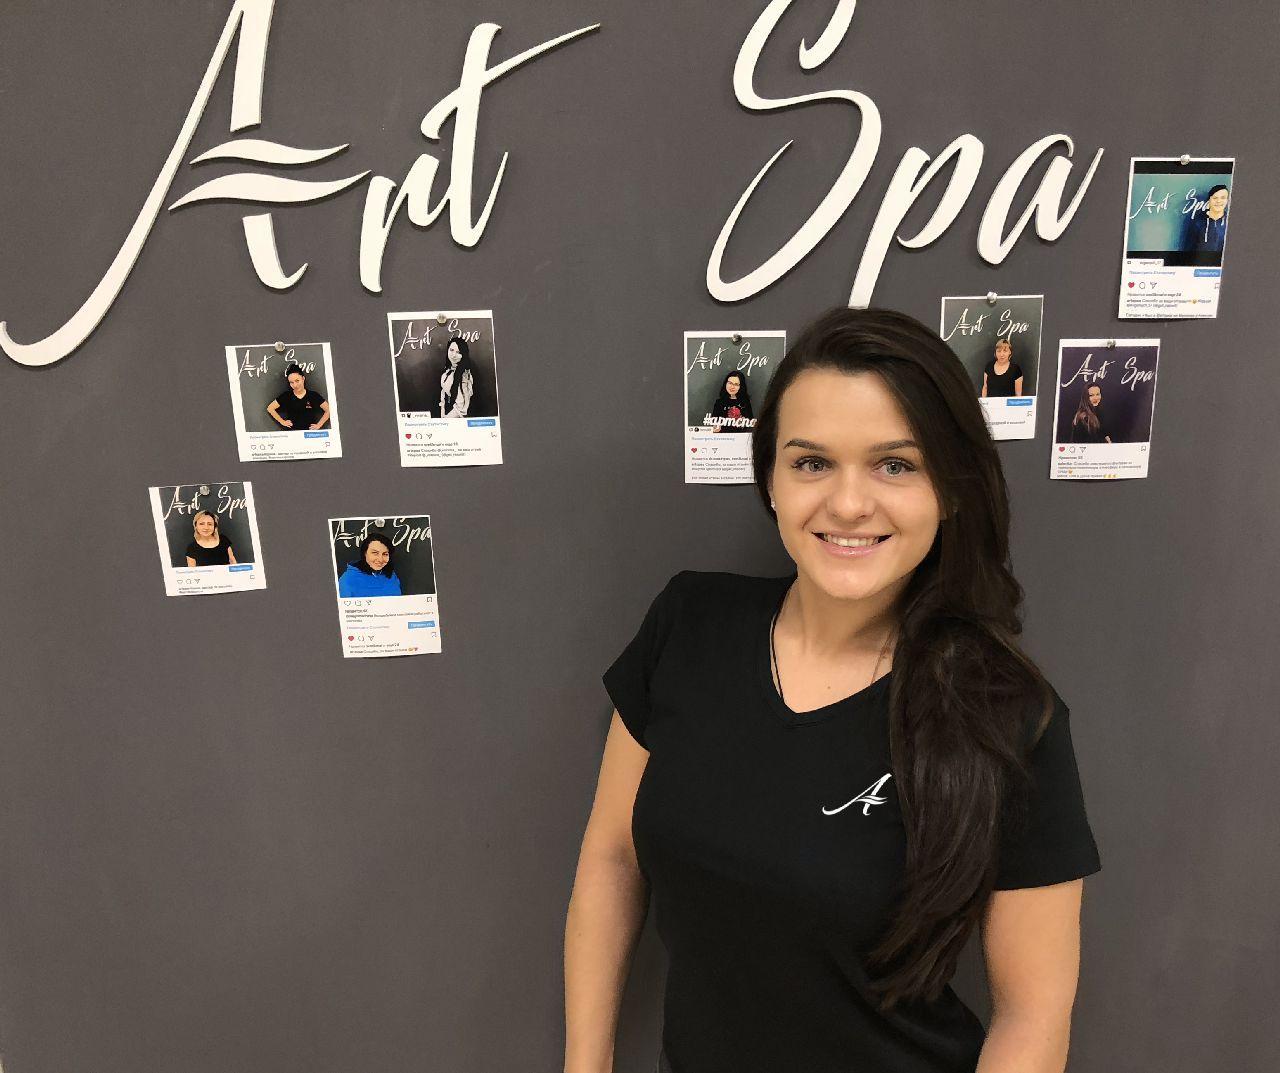 Елена - Мастер по перманентному макияжу | Спа центр «АРТ SPA»